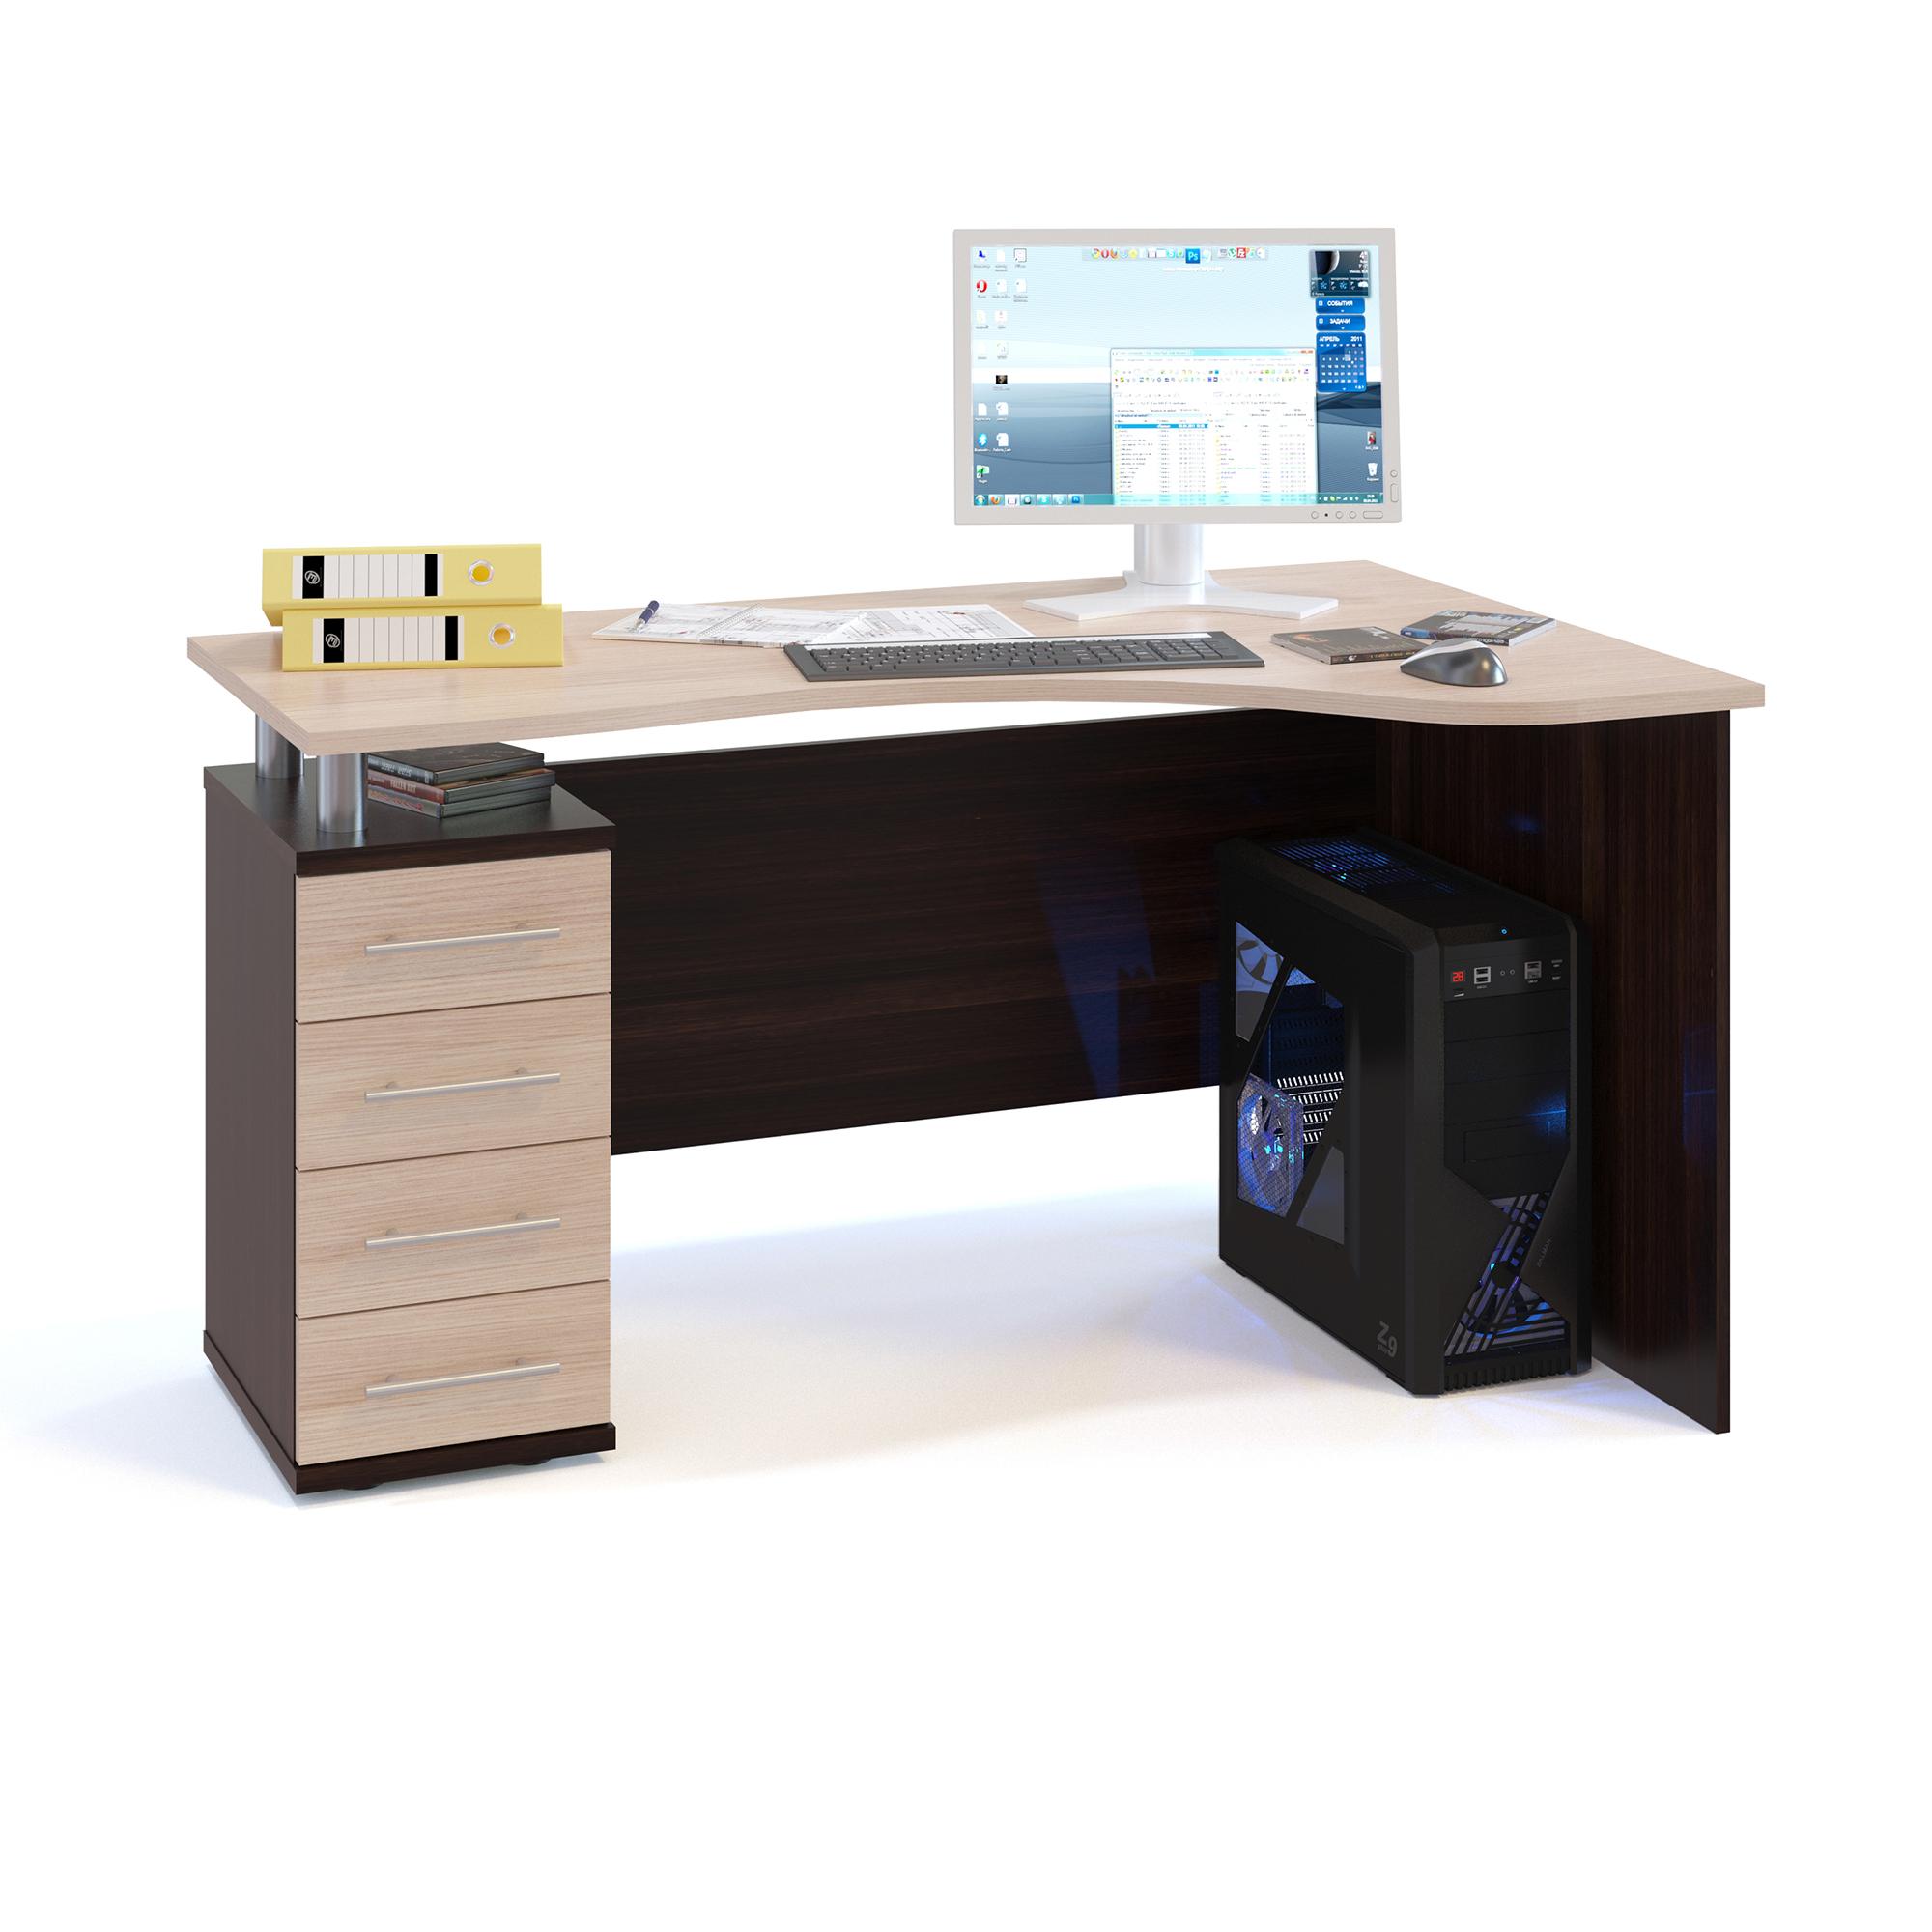 Компьютерный стол СОКОЛ КСТ-104.1Л 140x86x75, дуб венге/белёный дуб